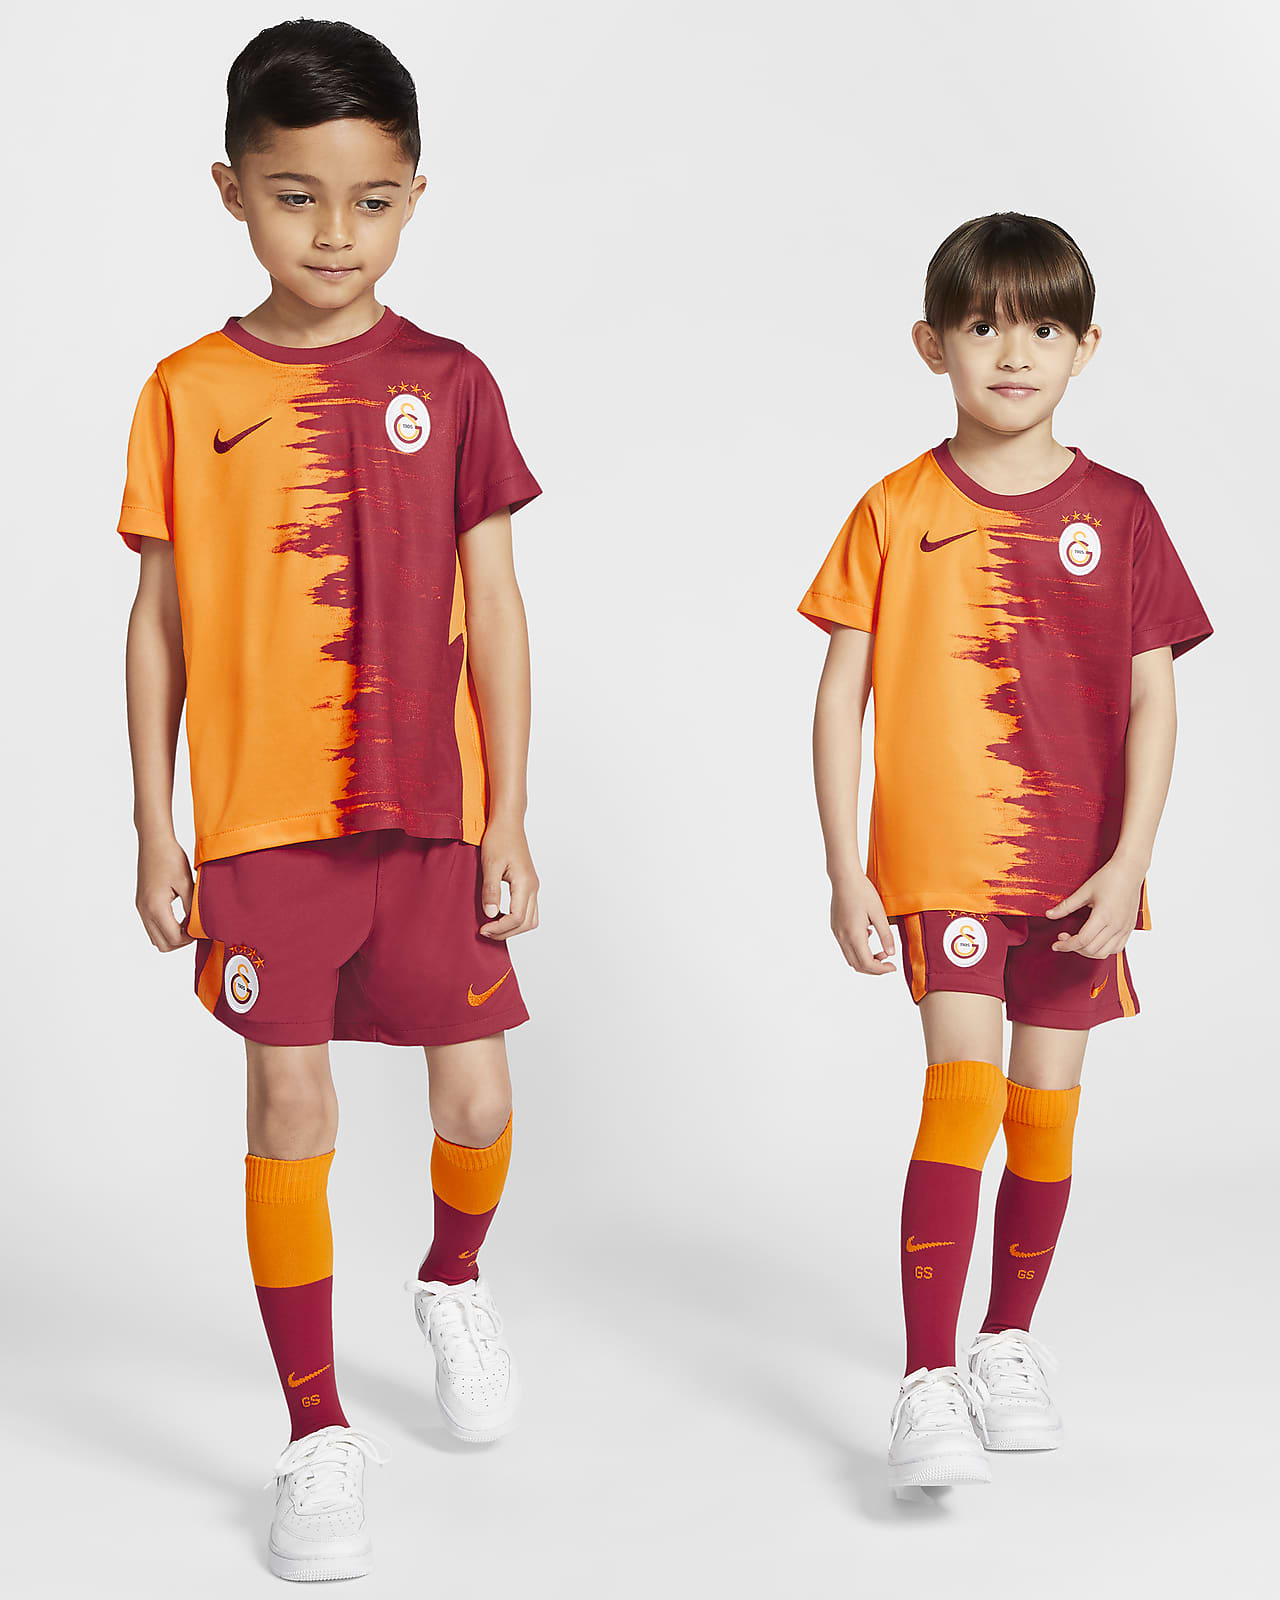 Galatasaray 2020/21 Home Fußballtrikot-Set für Kinder